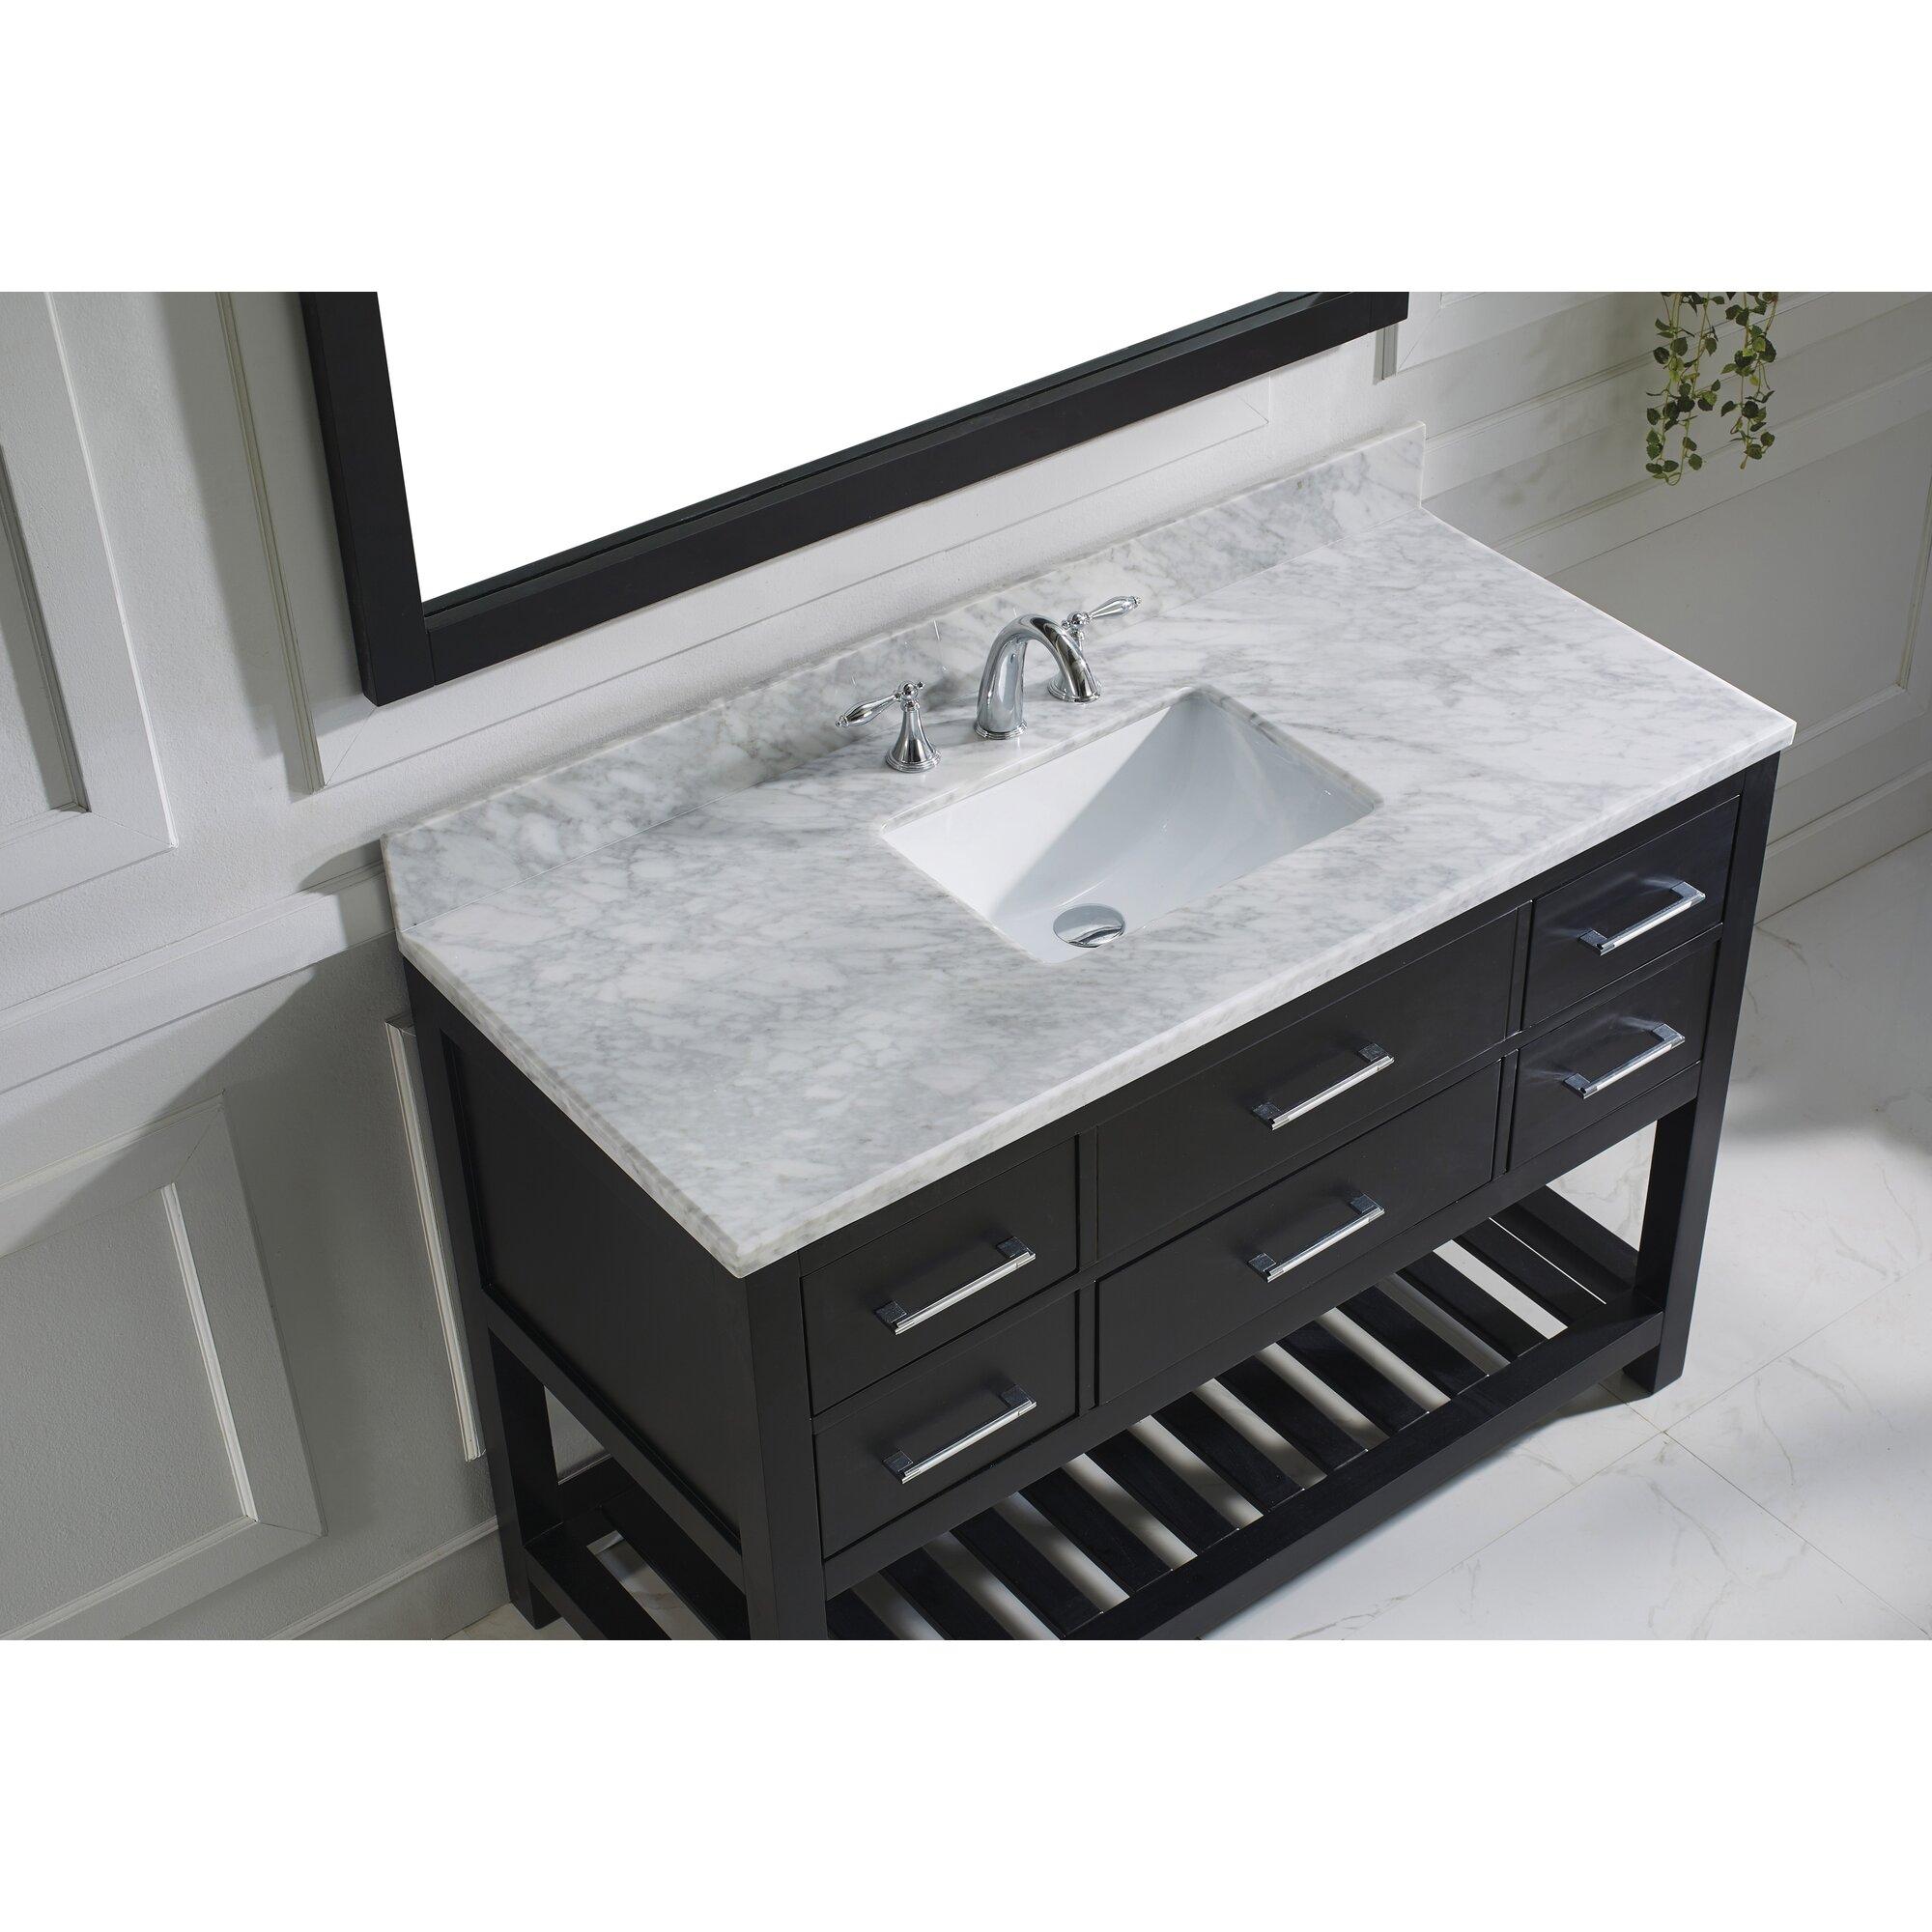 Virtu bathroom accessories - Caroline Estate 49 Single Bathroom Vanity Set With White Marble Top And Mirror